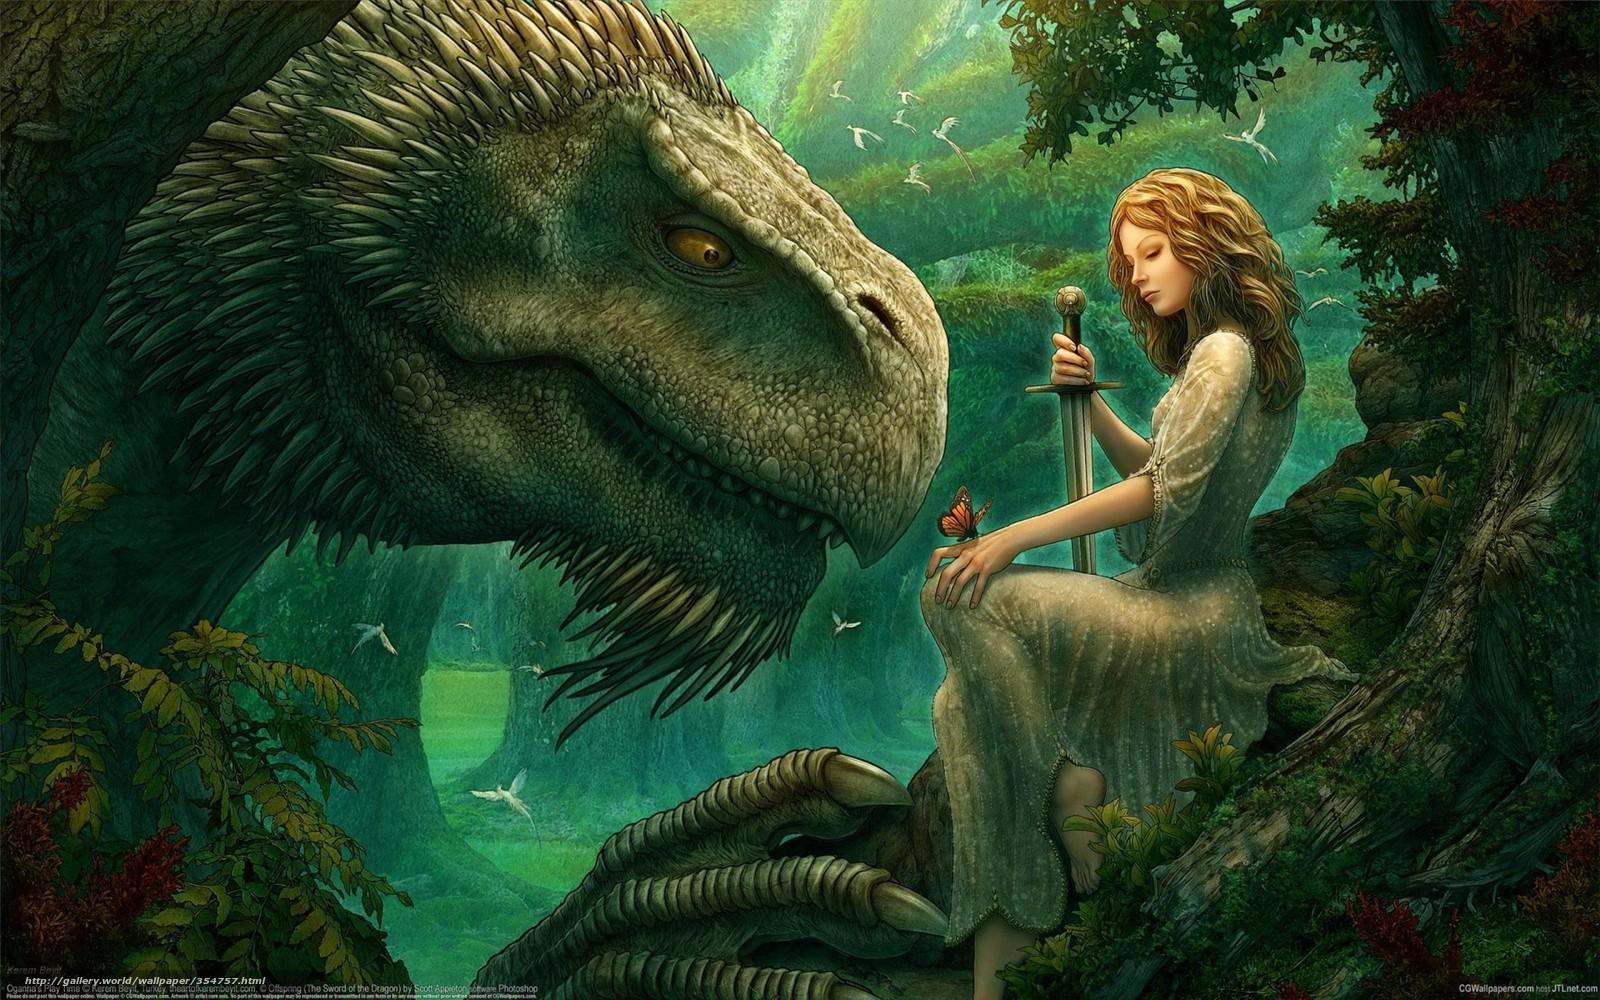 enchanted forest dragon original - photo #16